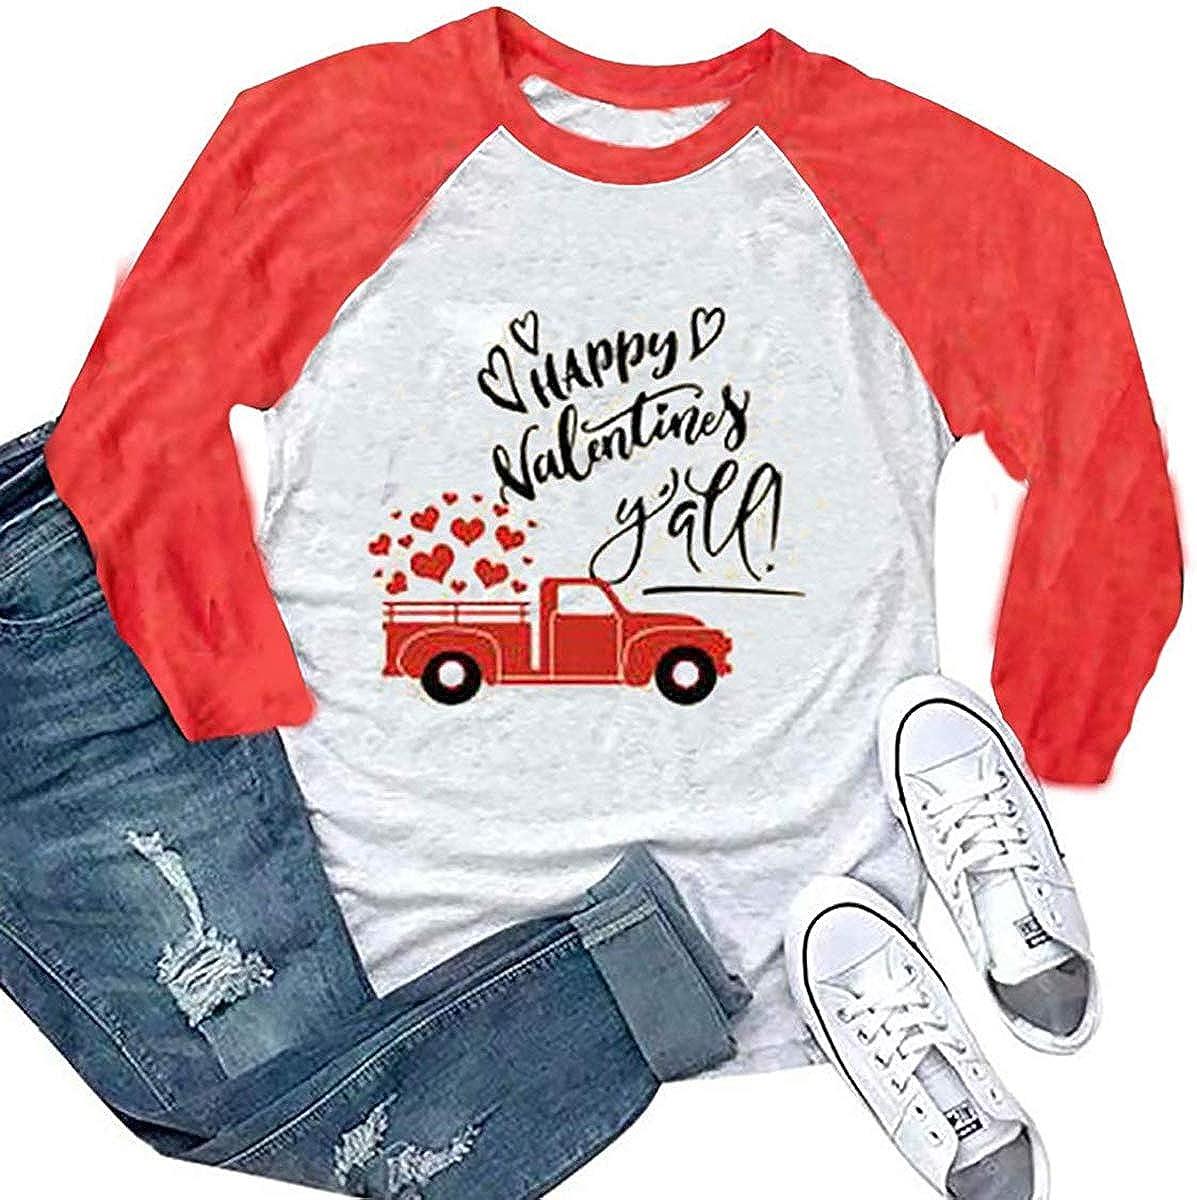 Baseball Tee Raglan Valentine Day Tee Black Raglan Tee Black Valentine/'s Day Bodysuit Kids Shirts Love Valentine Day T Shirt